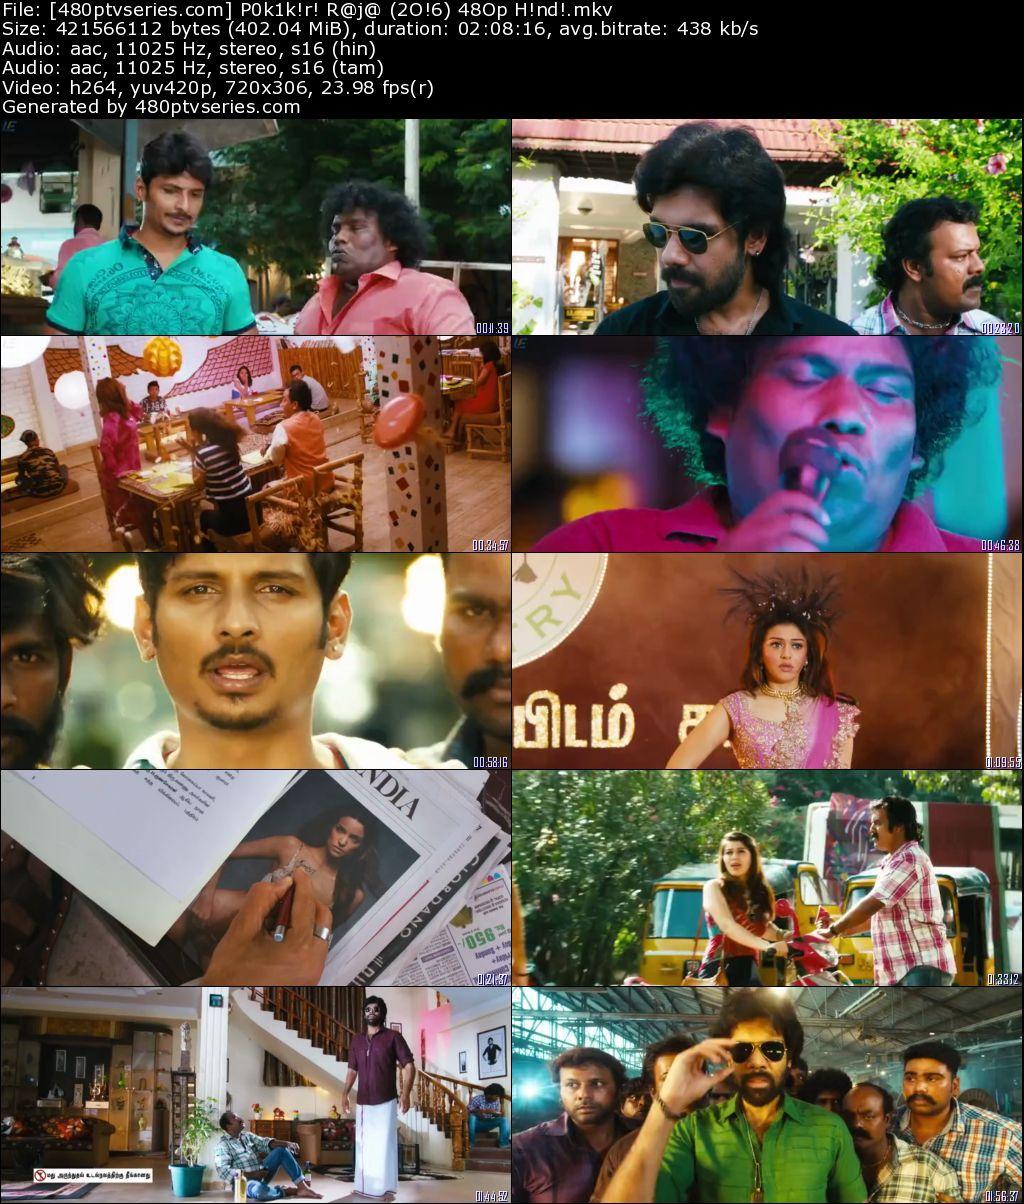 Pokkiri Raja (2016) 400MB Full Hindi Dual Audio Movie Download 480p HDRip Free Watch Online Full Movie Download Worldfree4u 9xmovies